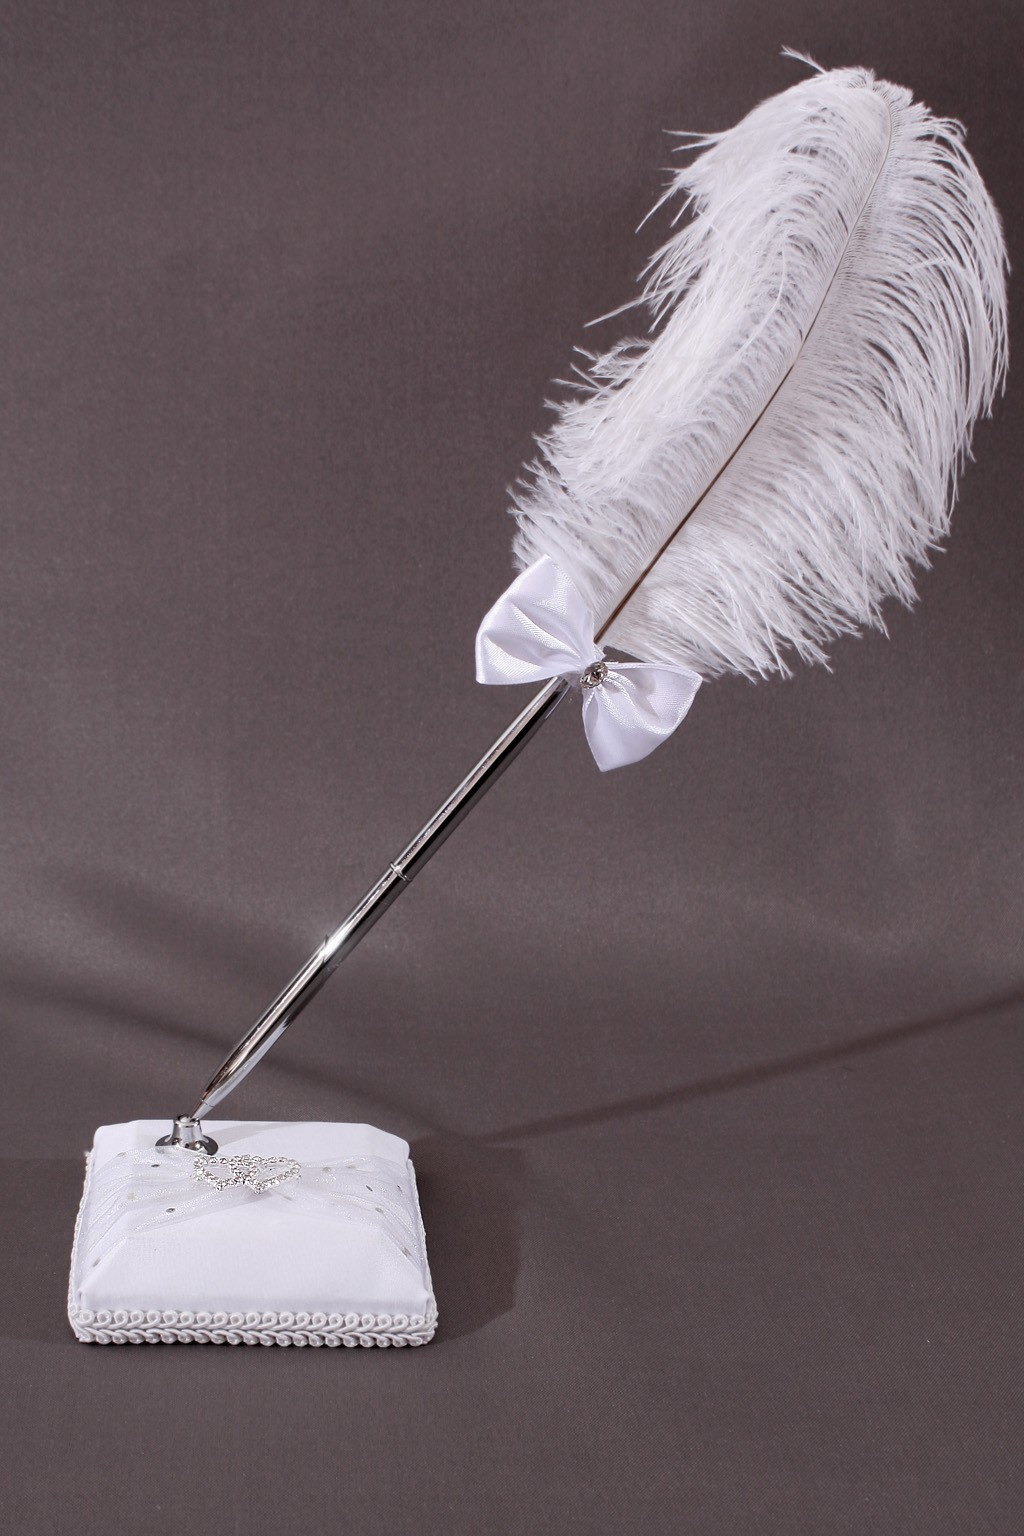 porte stylo plume mariage blanc coeur strass ruban. Black Bedroom Furniture Sets. Home Design Ideas